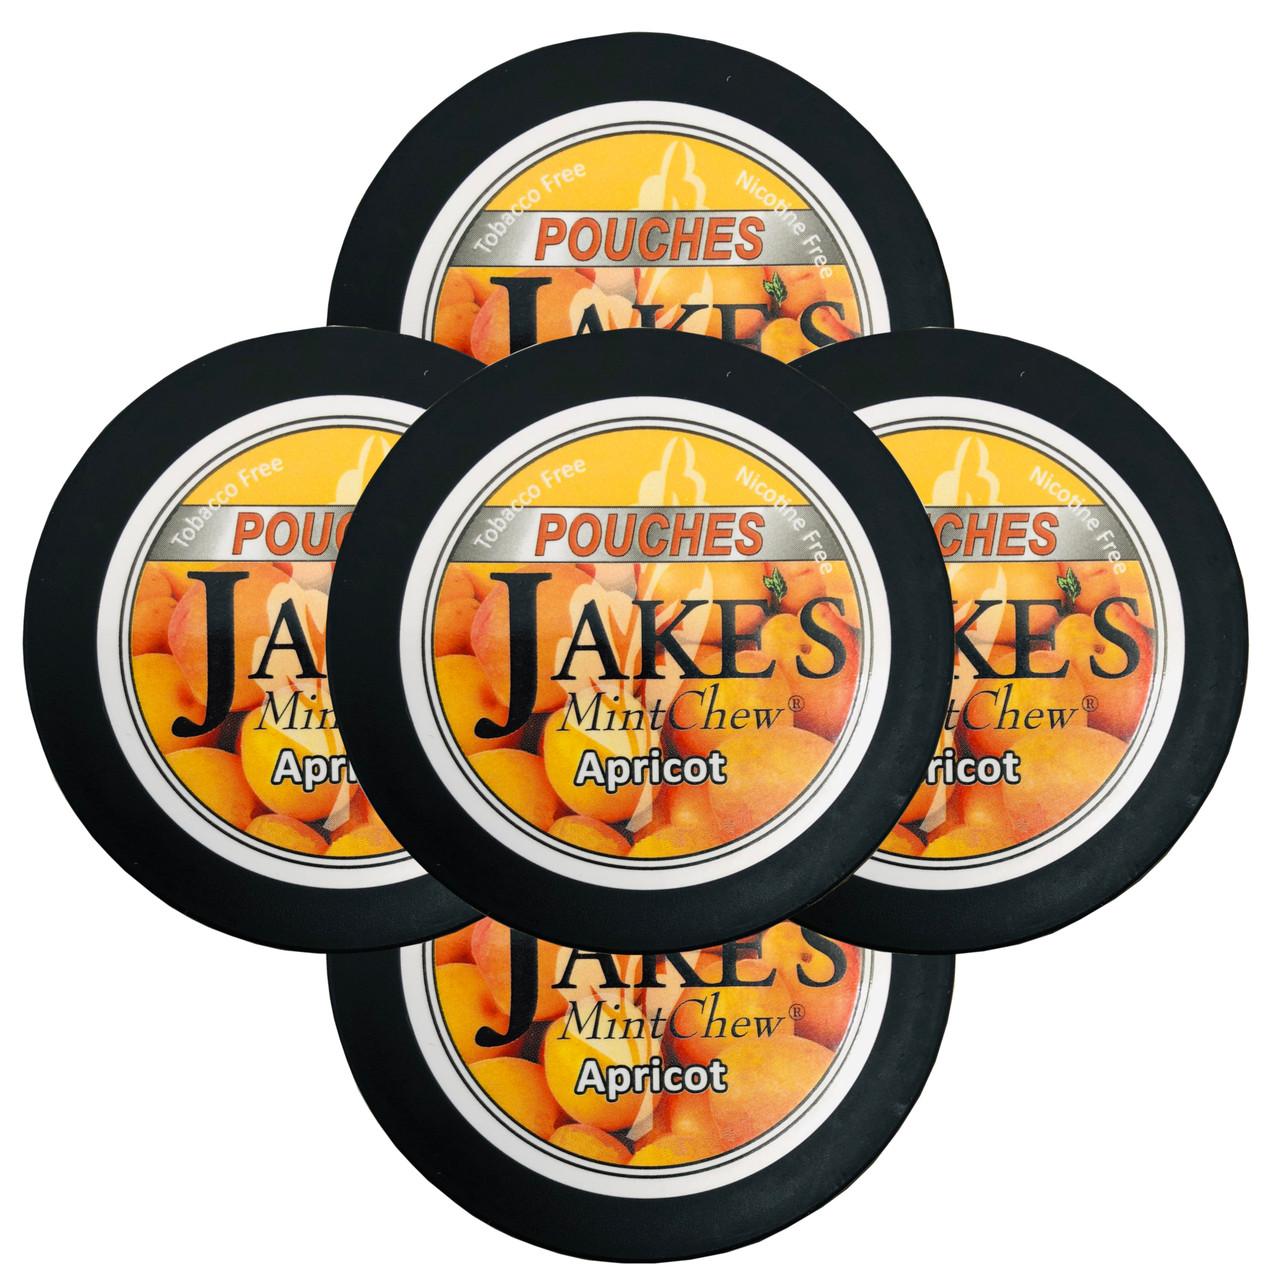 Jake's Mint Chew Pouches Apricot 5 Cans